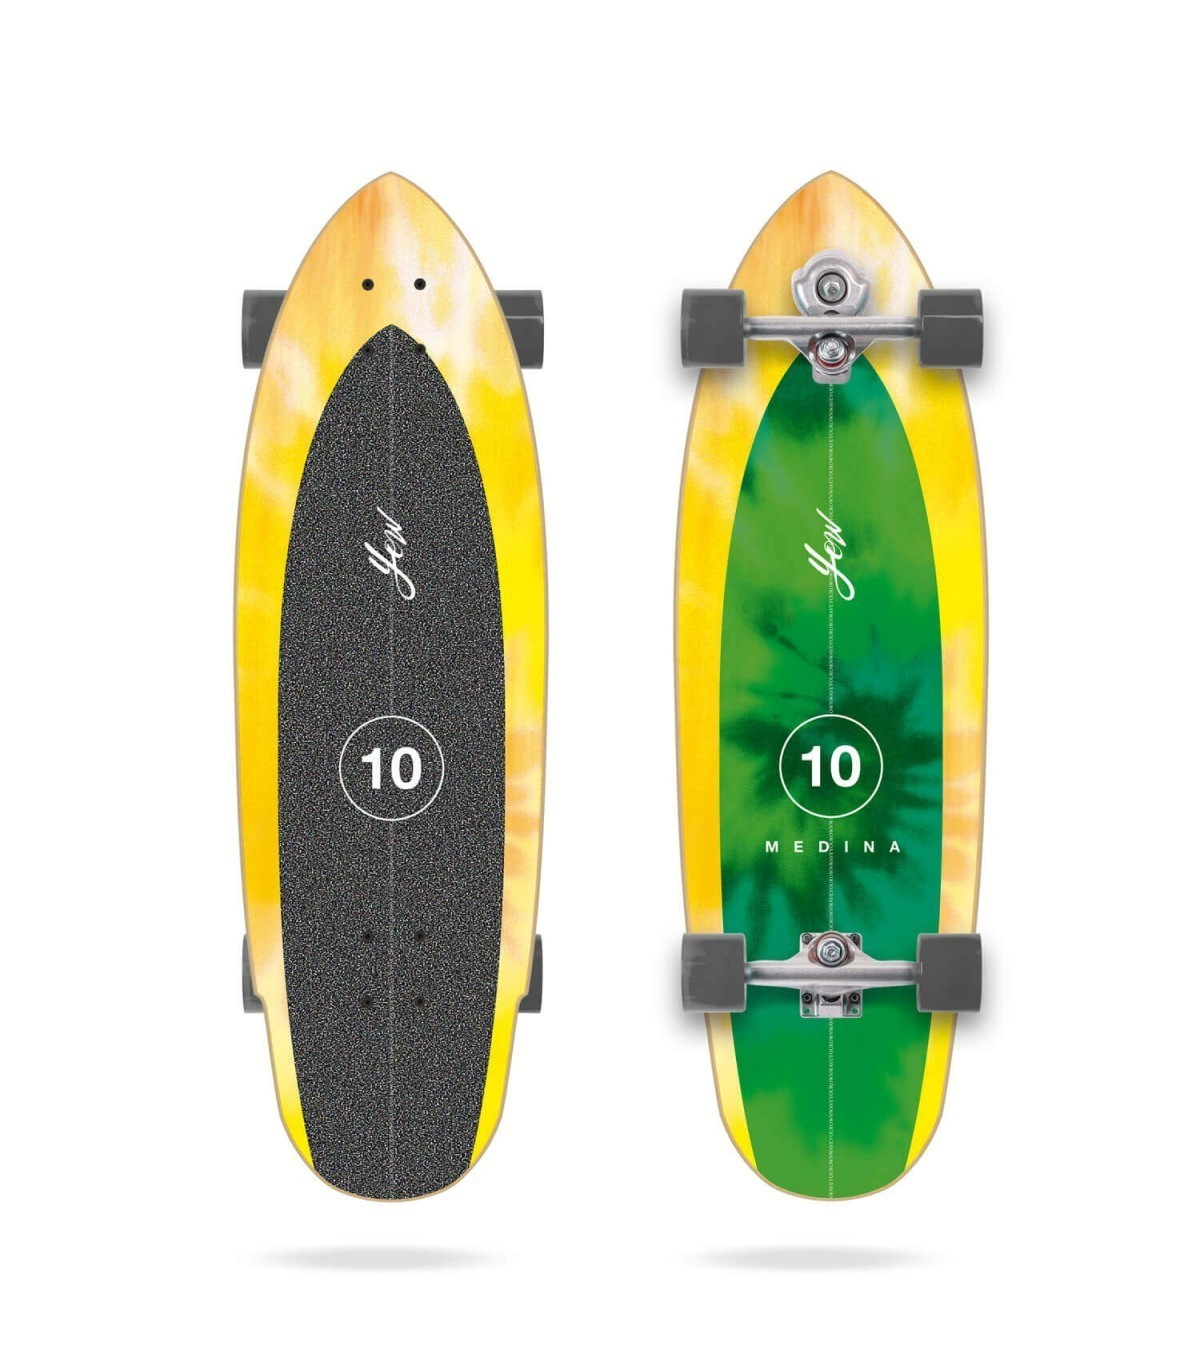 "YOW MEDINA TIE DYE 33"" SURFSKATE"